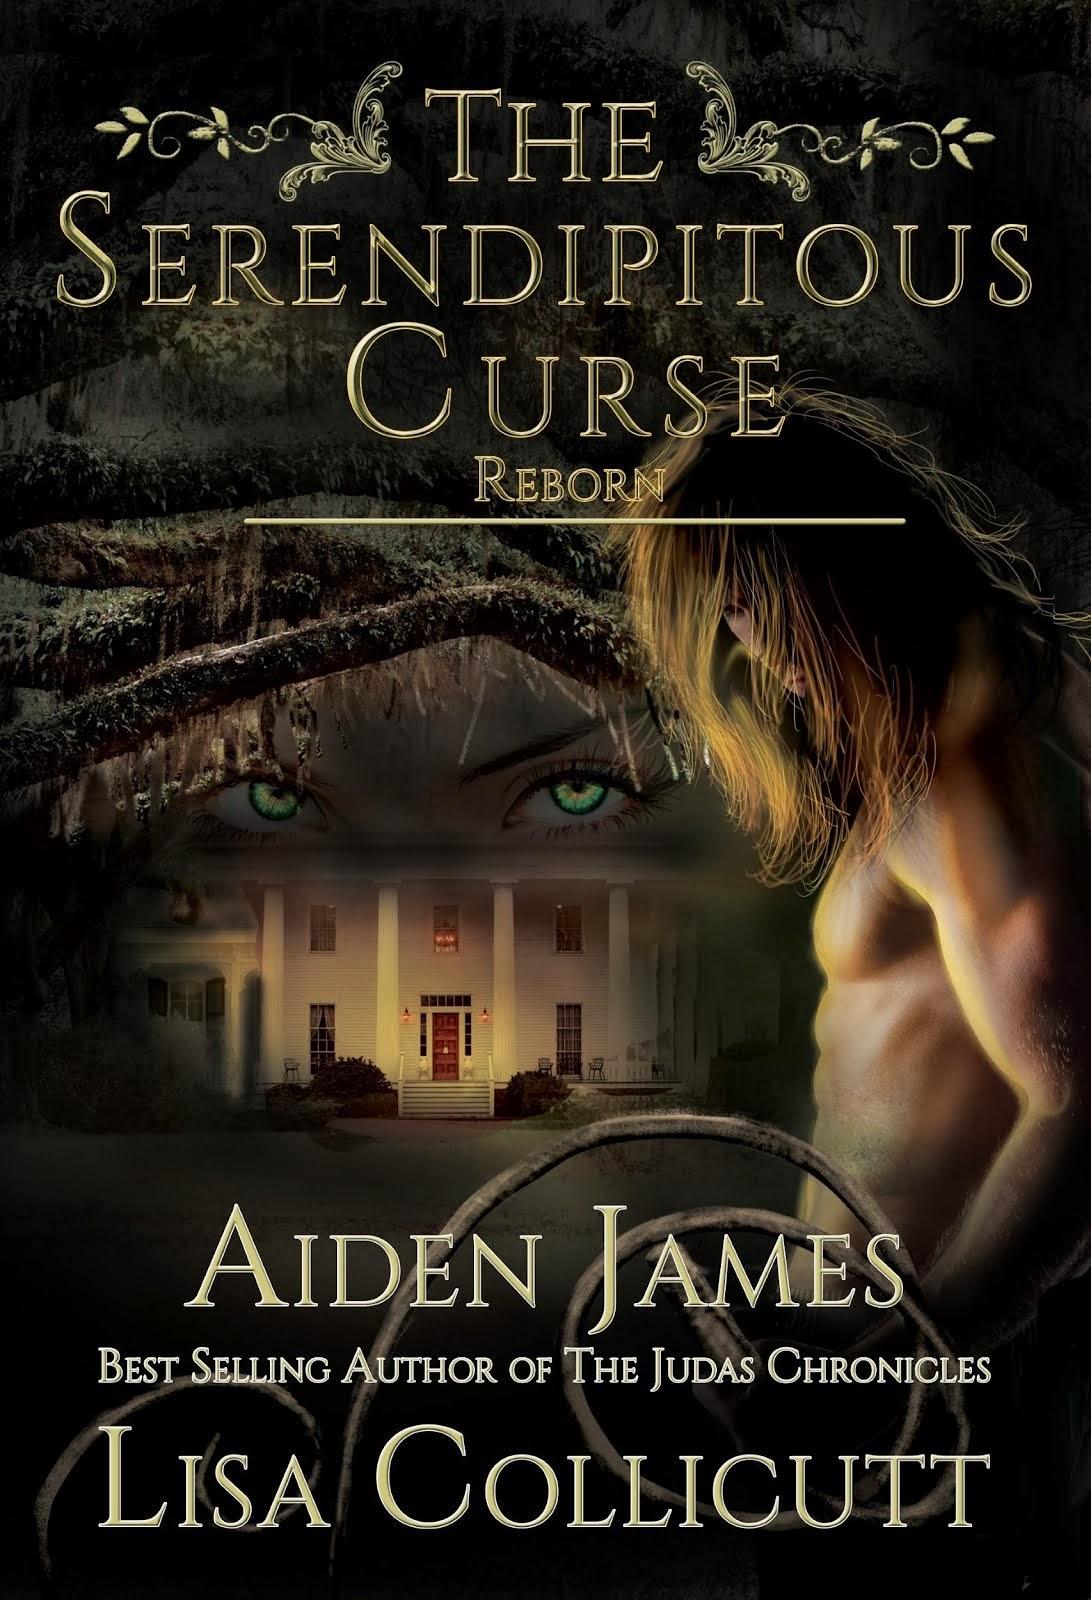 The Serendipitous Curse: Reborn